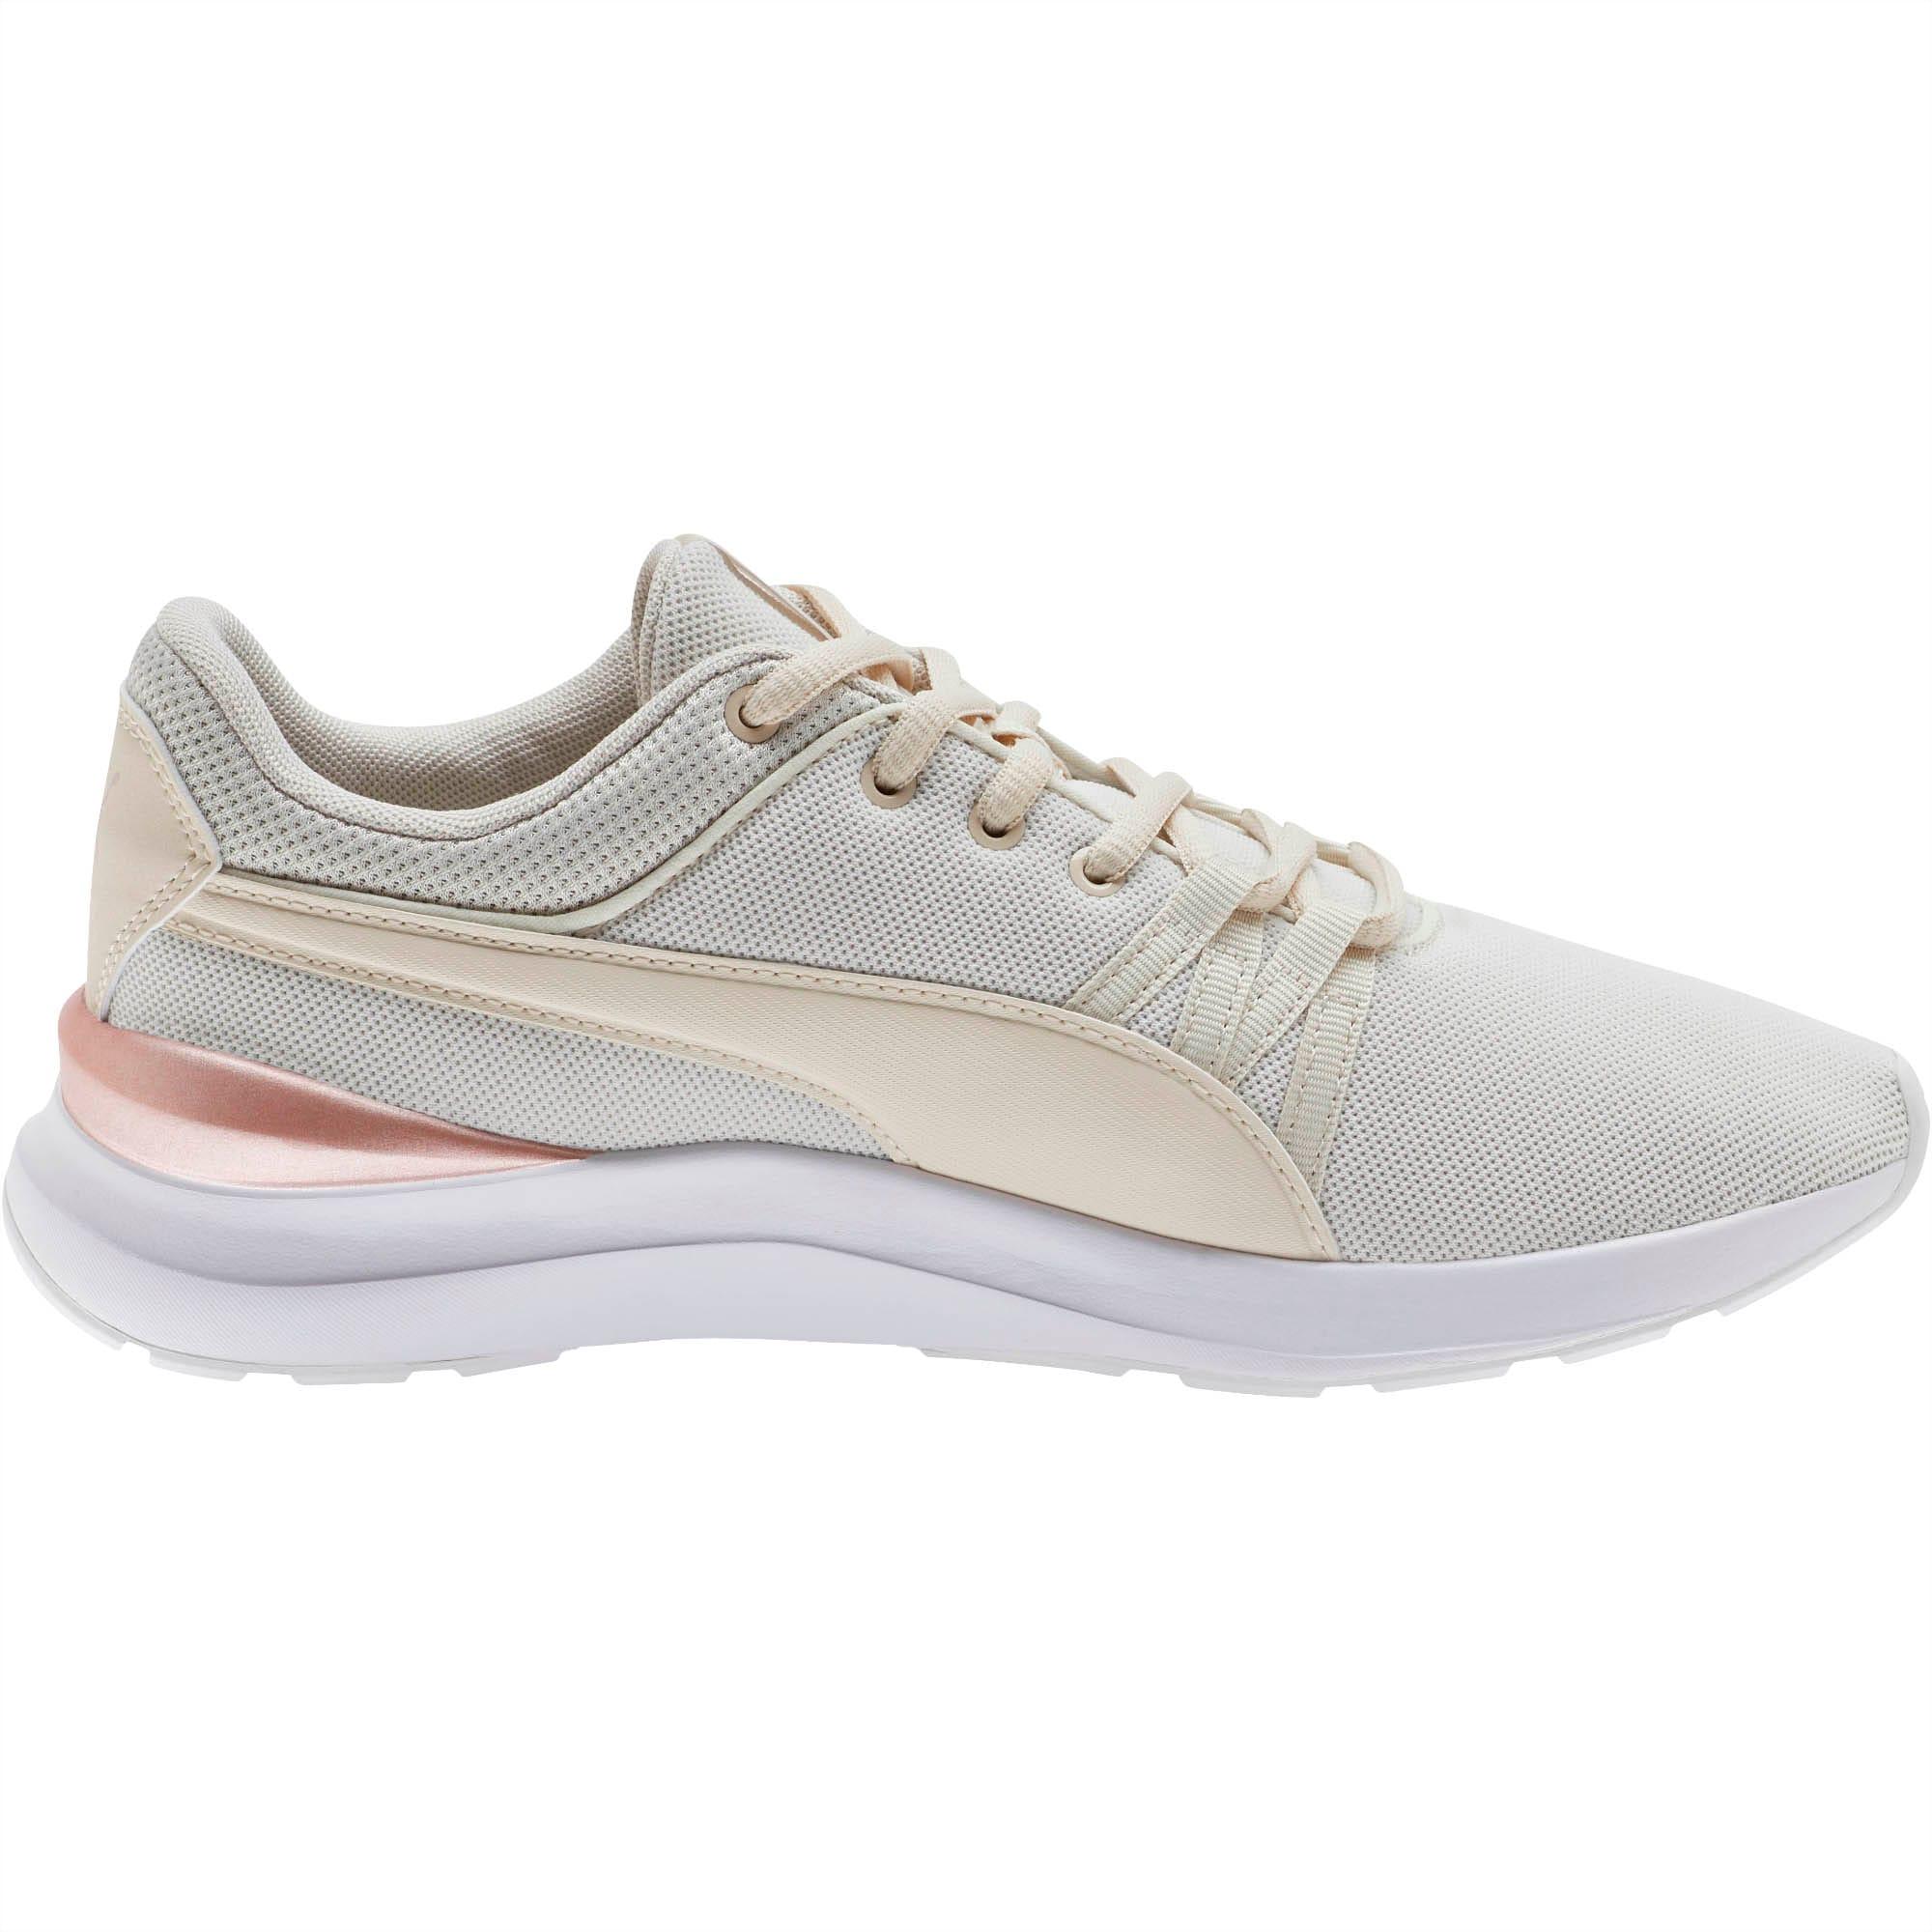 Adela Mesh Womens Sneakers   PUMA US